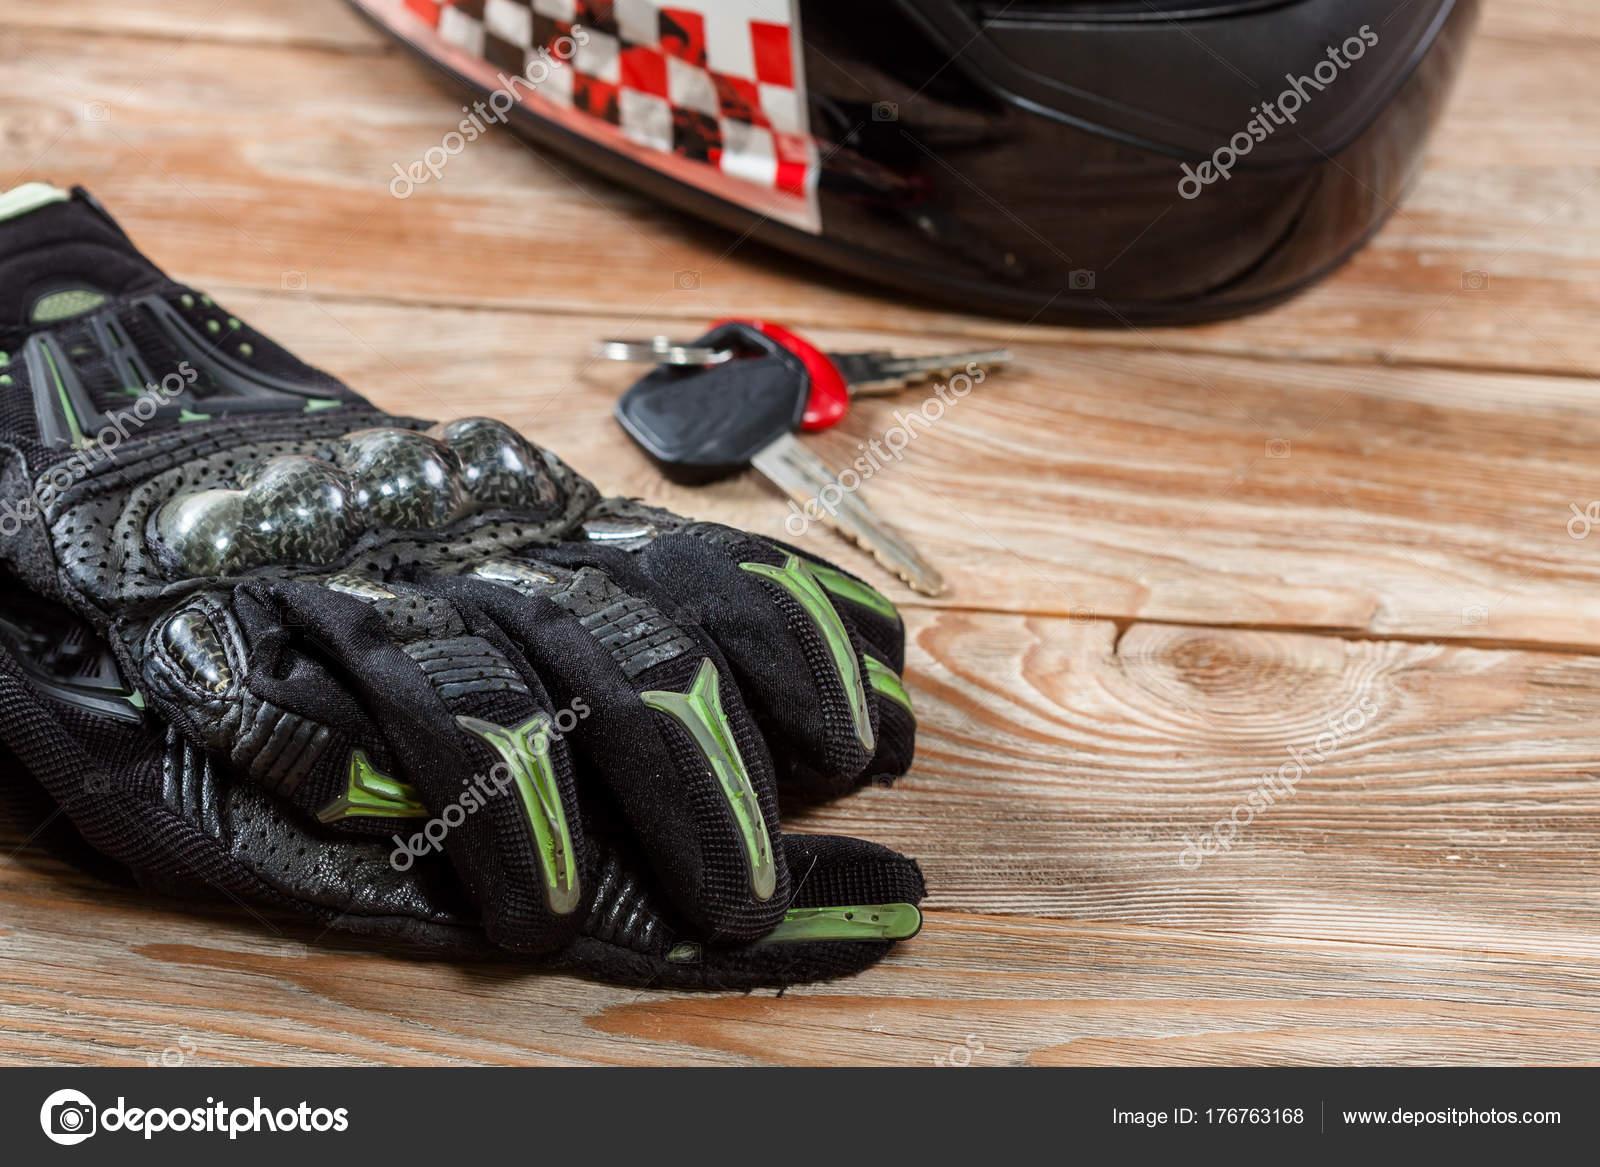 Pohled Na Motocyklu Jezdec Prislusenstvi Na Rustikalni Drevene Kartu